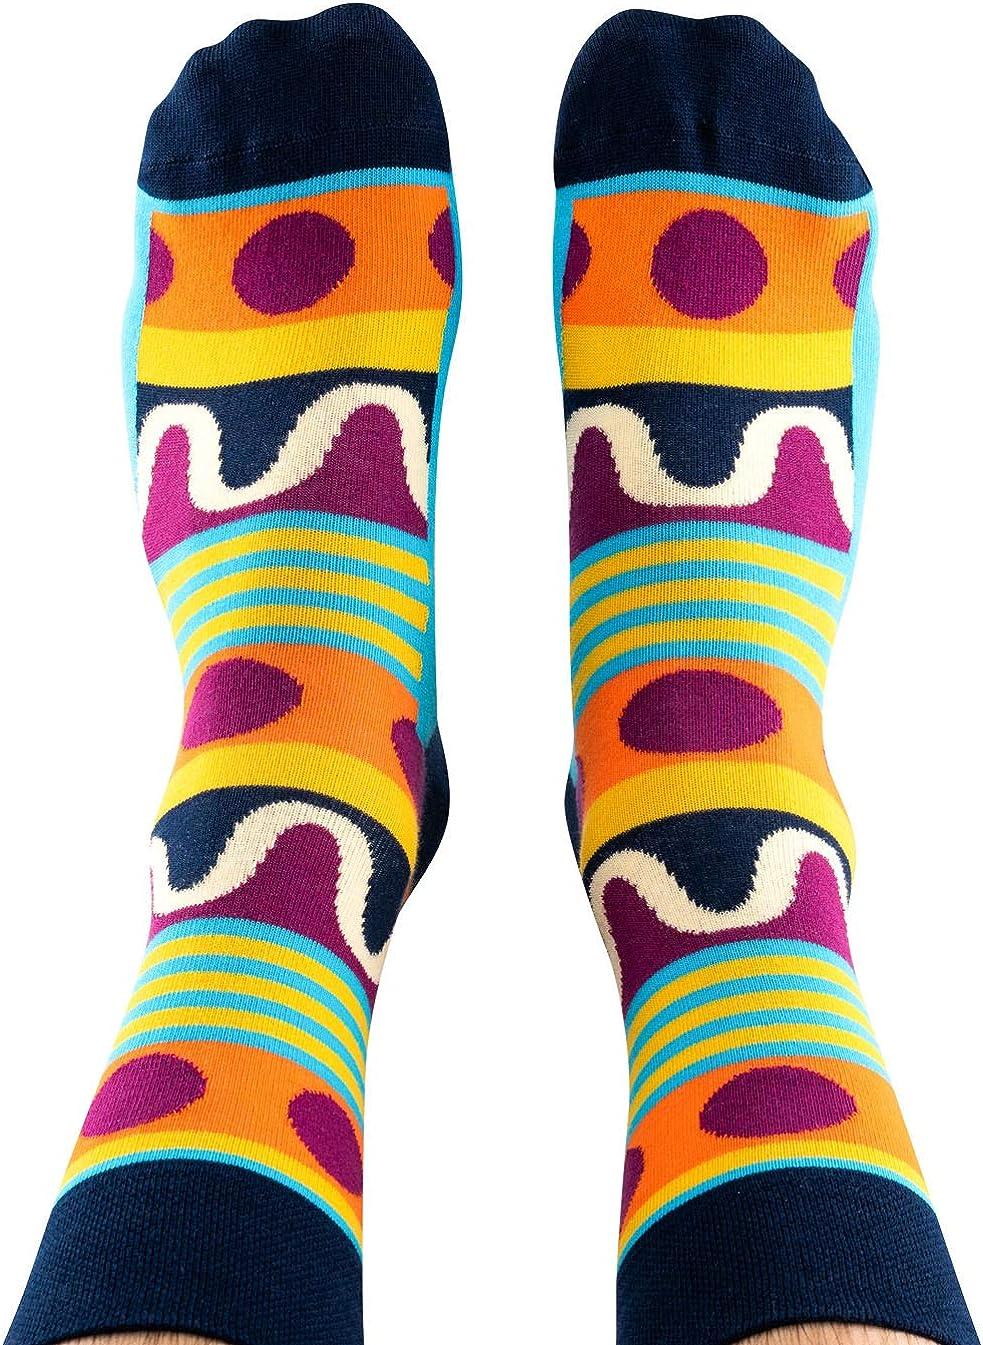 Bunter Lutscher TODO COLOURS Casual Motiv Socken lustige bunte Socken mehrfarbige